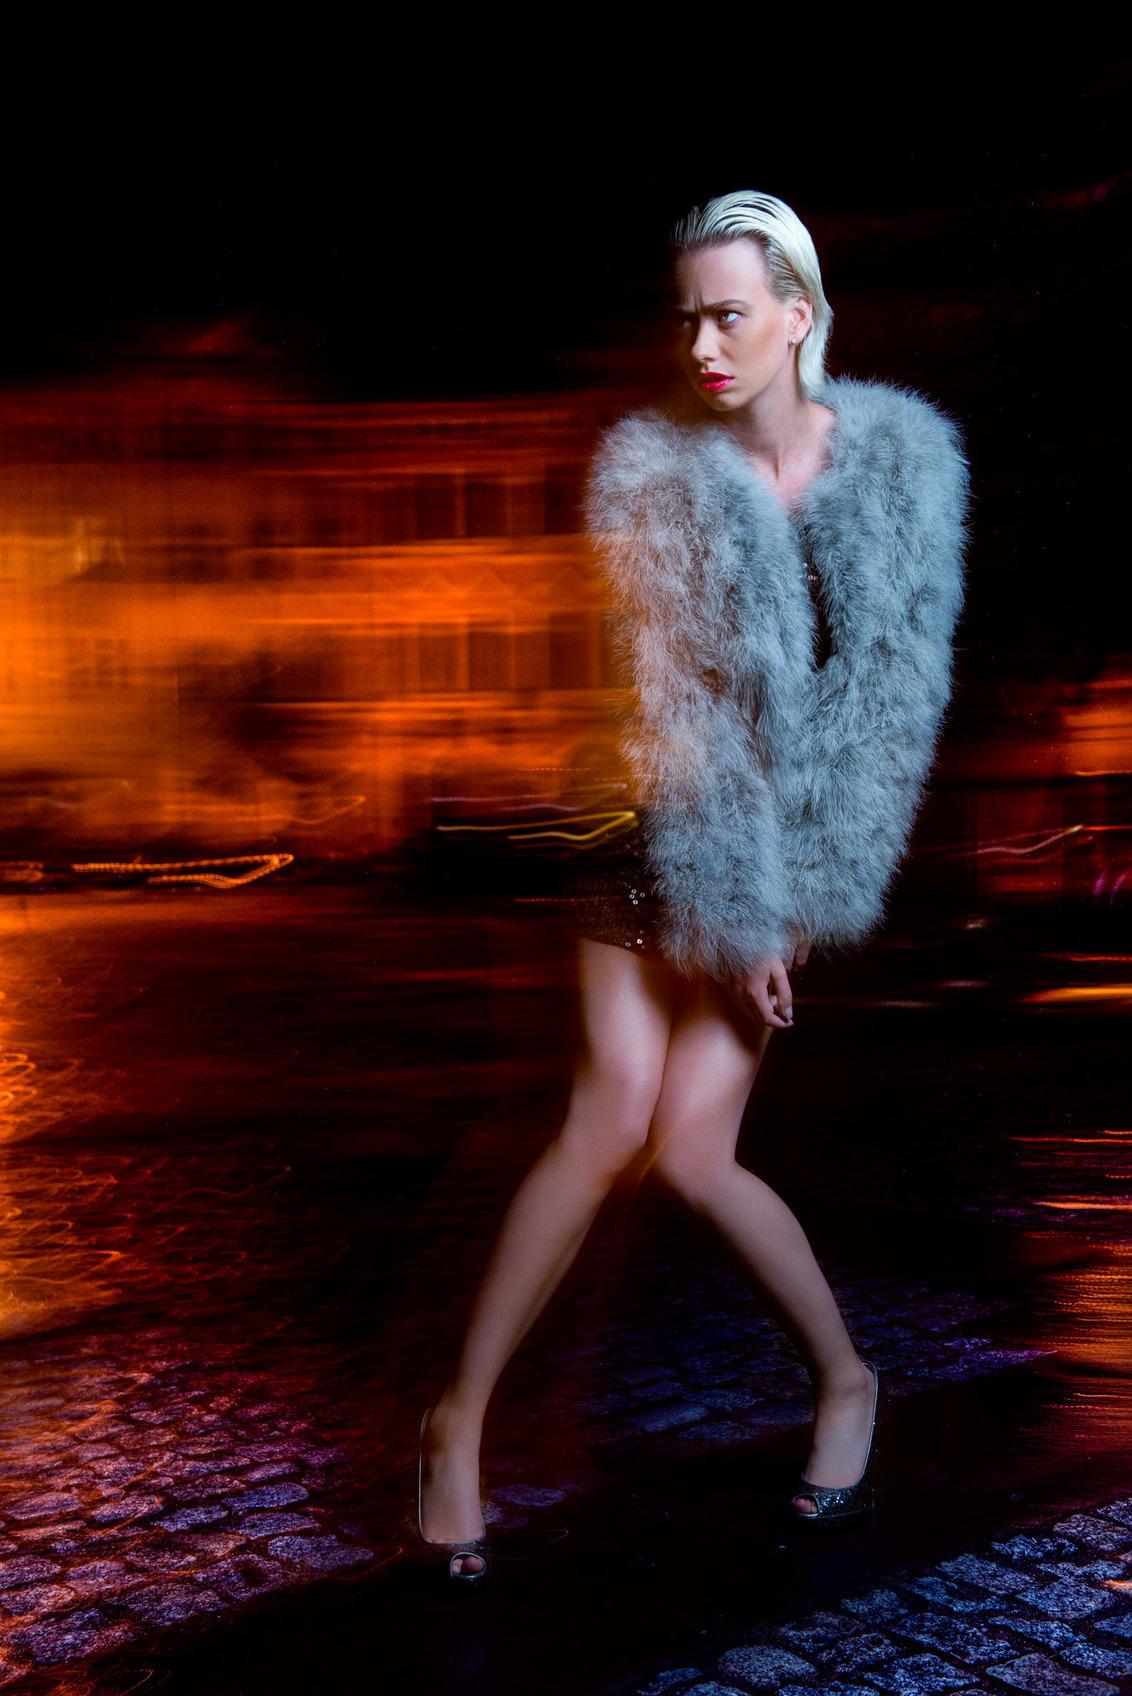 Night Fashion - Night Fashion Model: Lenaa Warmelink Makeup & hair: Madvhi Sahti Styling: Fayola Wekker Shot at Broumov, Czech Republic during the #Exposure15 Ev - foto door Beautifier op 02-02-2016 - deze foto bevat: kleur, licht, model, fashion, meisje, sfeer, nachtfotografie, pose, belichting, expressie, mode, fotoshoot, kleding, visagie, locatie, langesluitertijd, styling, editorial, strobist, fashionfotografie